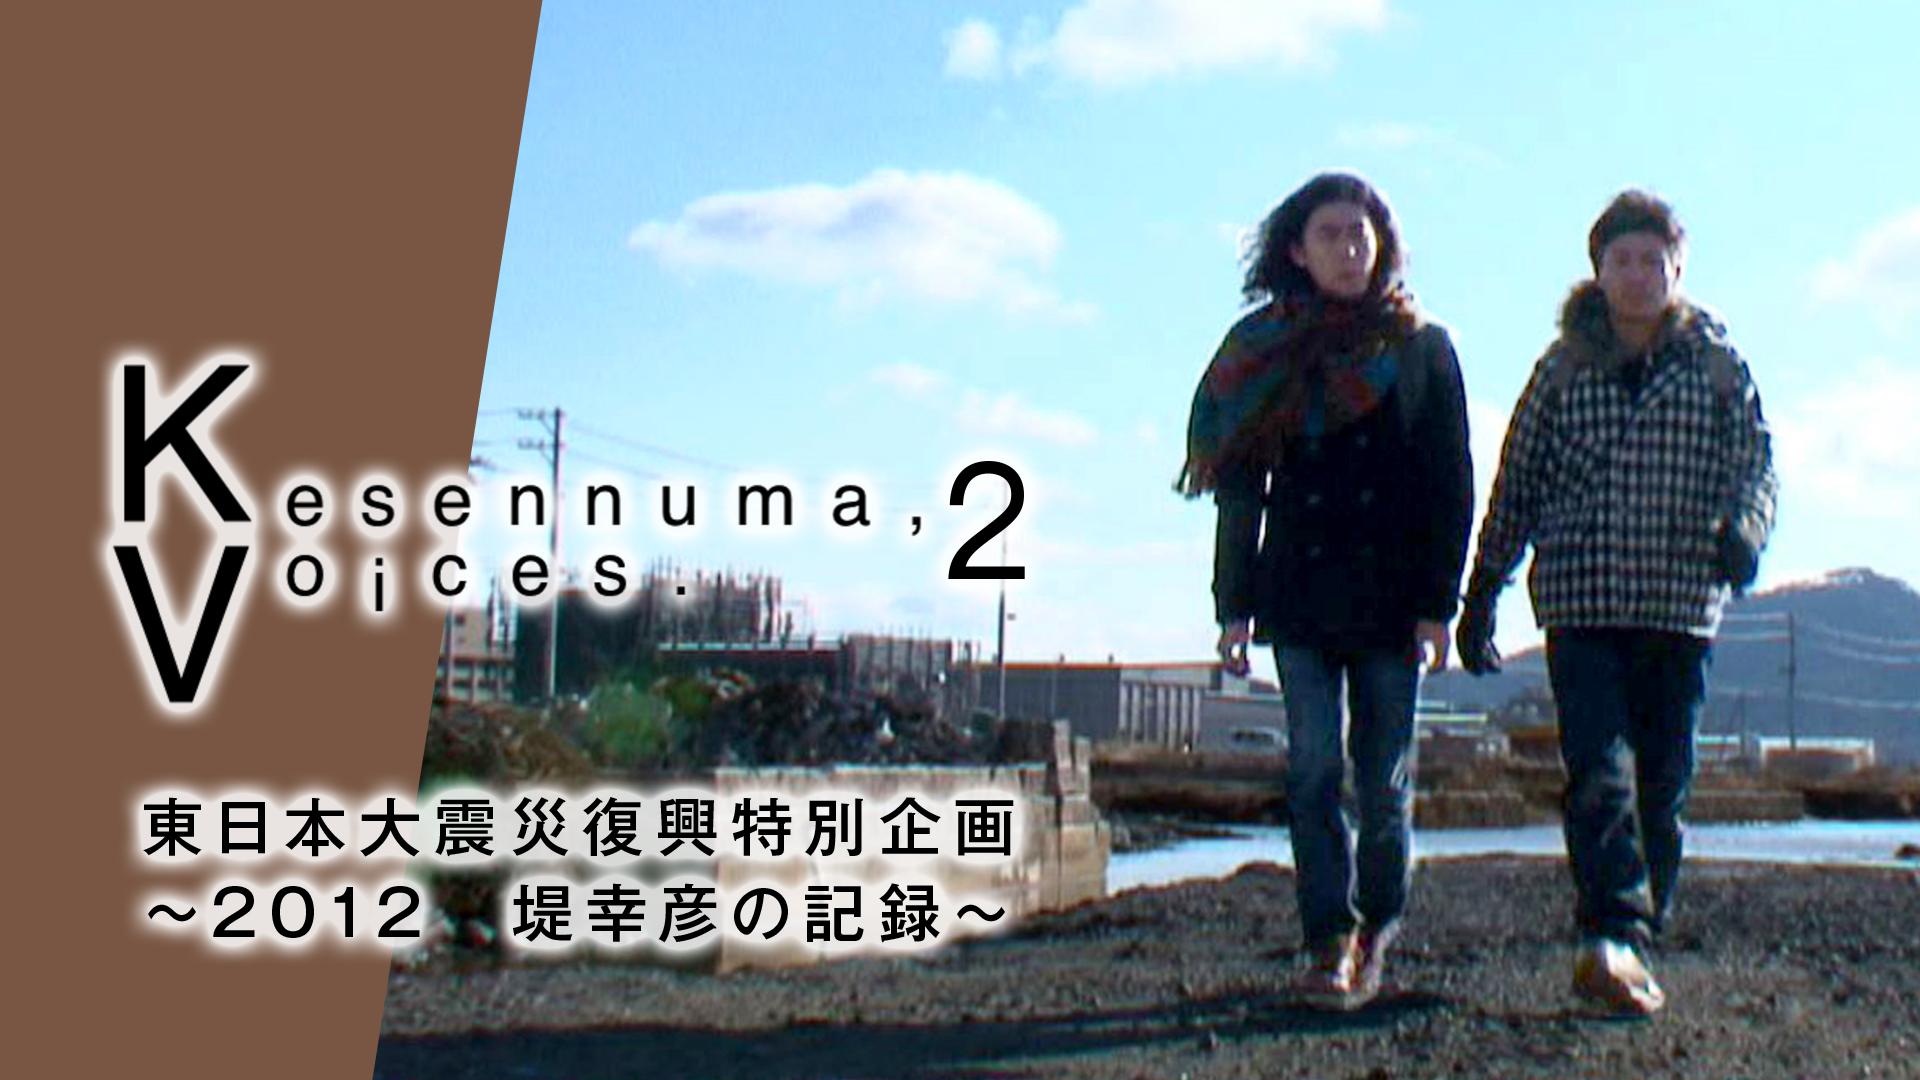 Kesennuma,Voices.2 東日本大震災復興特別企画~2012 堤幸彦の記録~